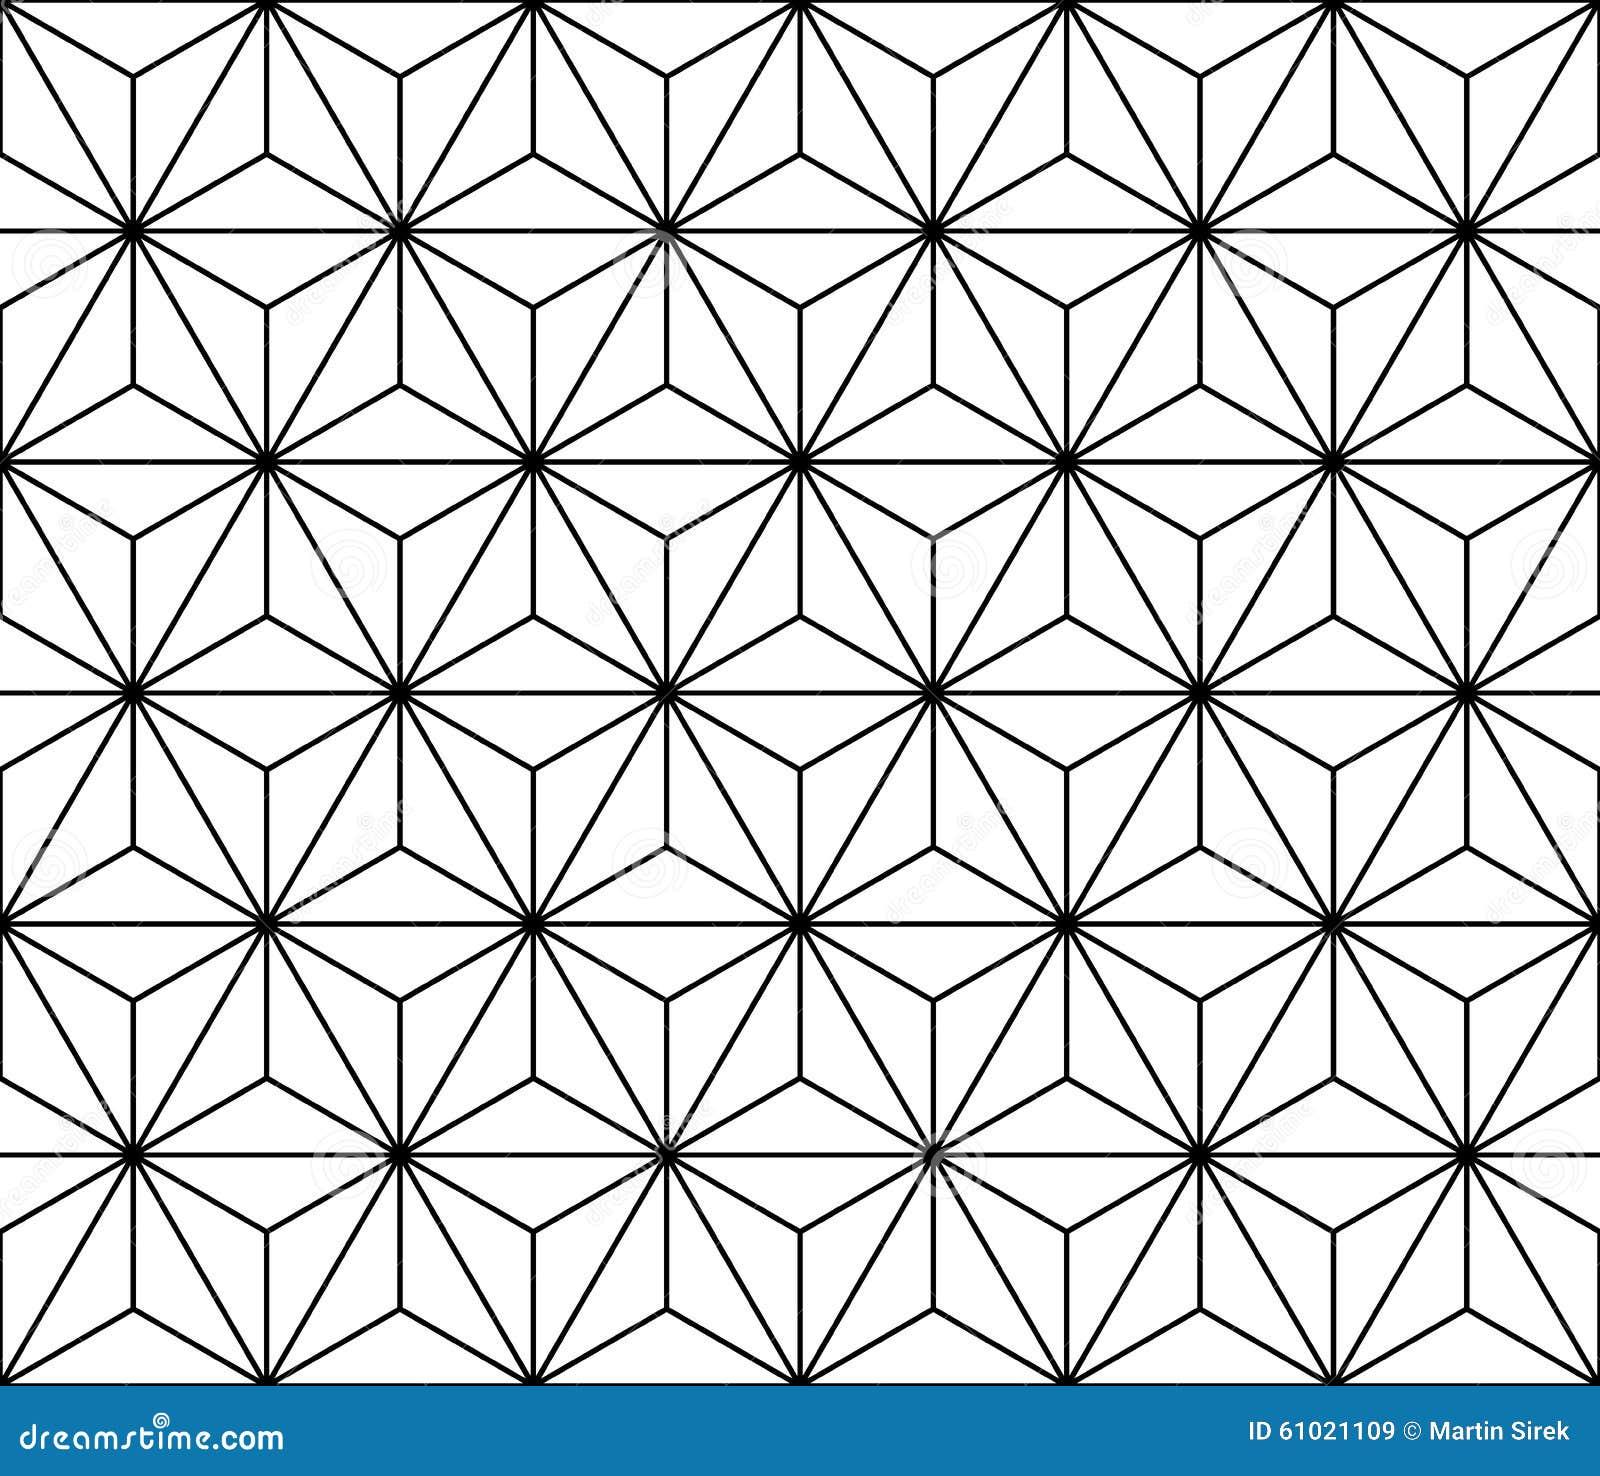 Vector modern naadloos heilig meetkundepatroon, zwart-witte samenvatting